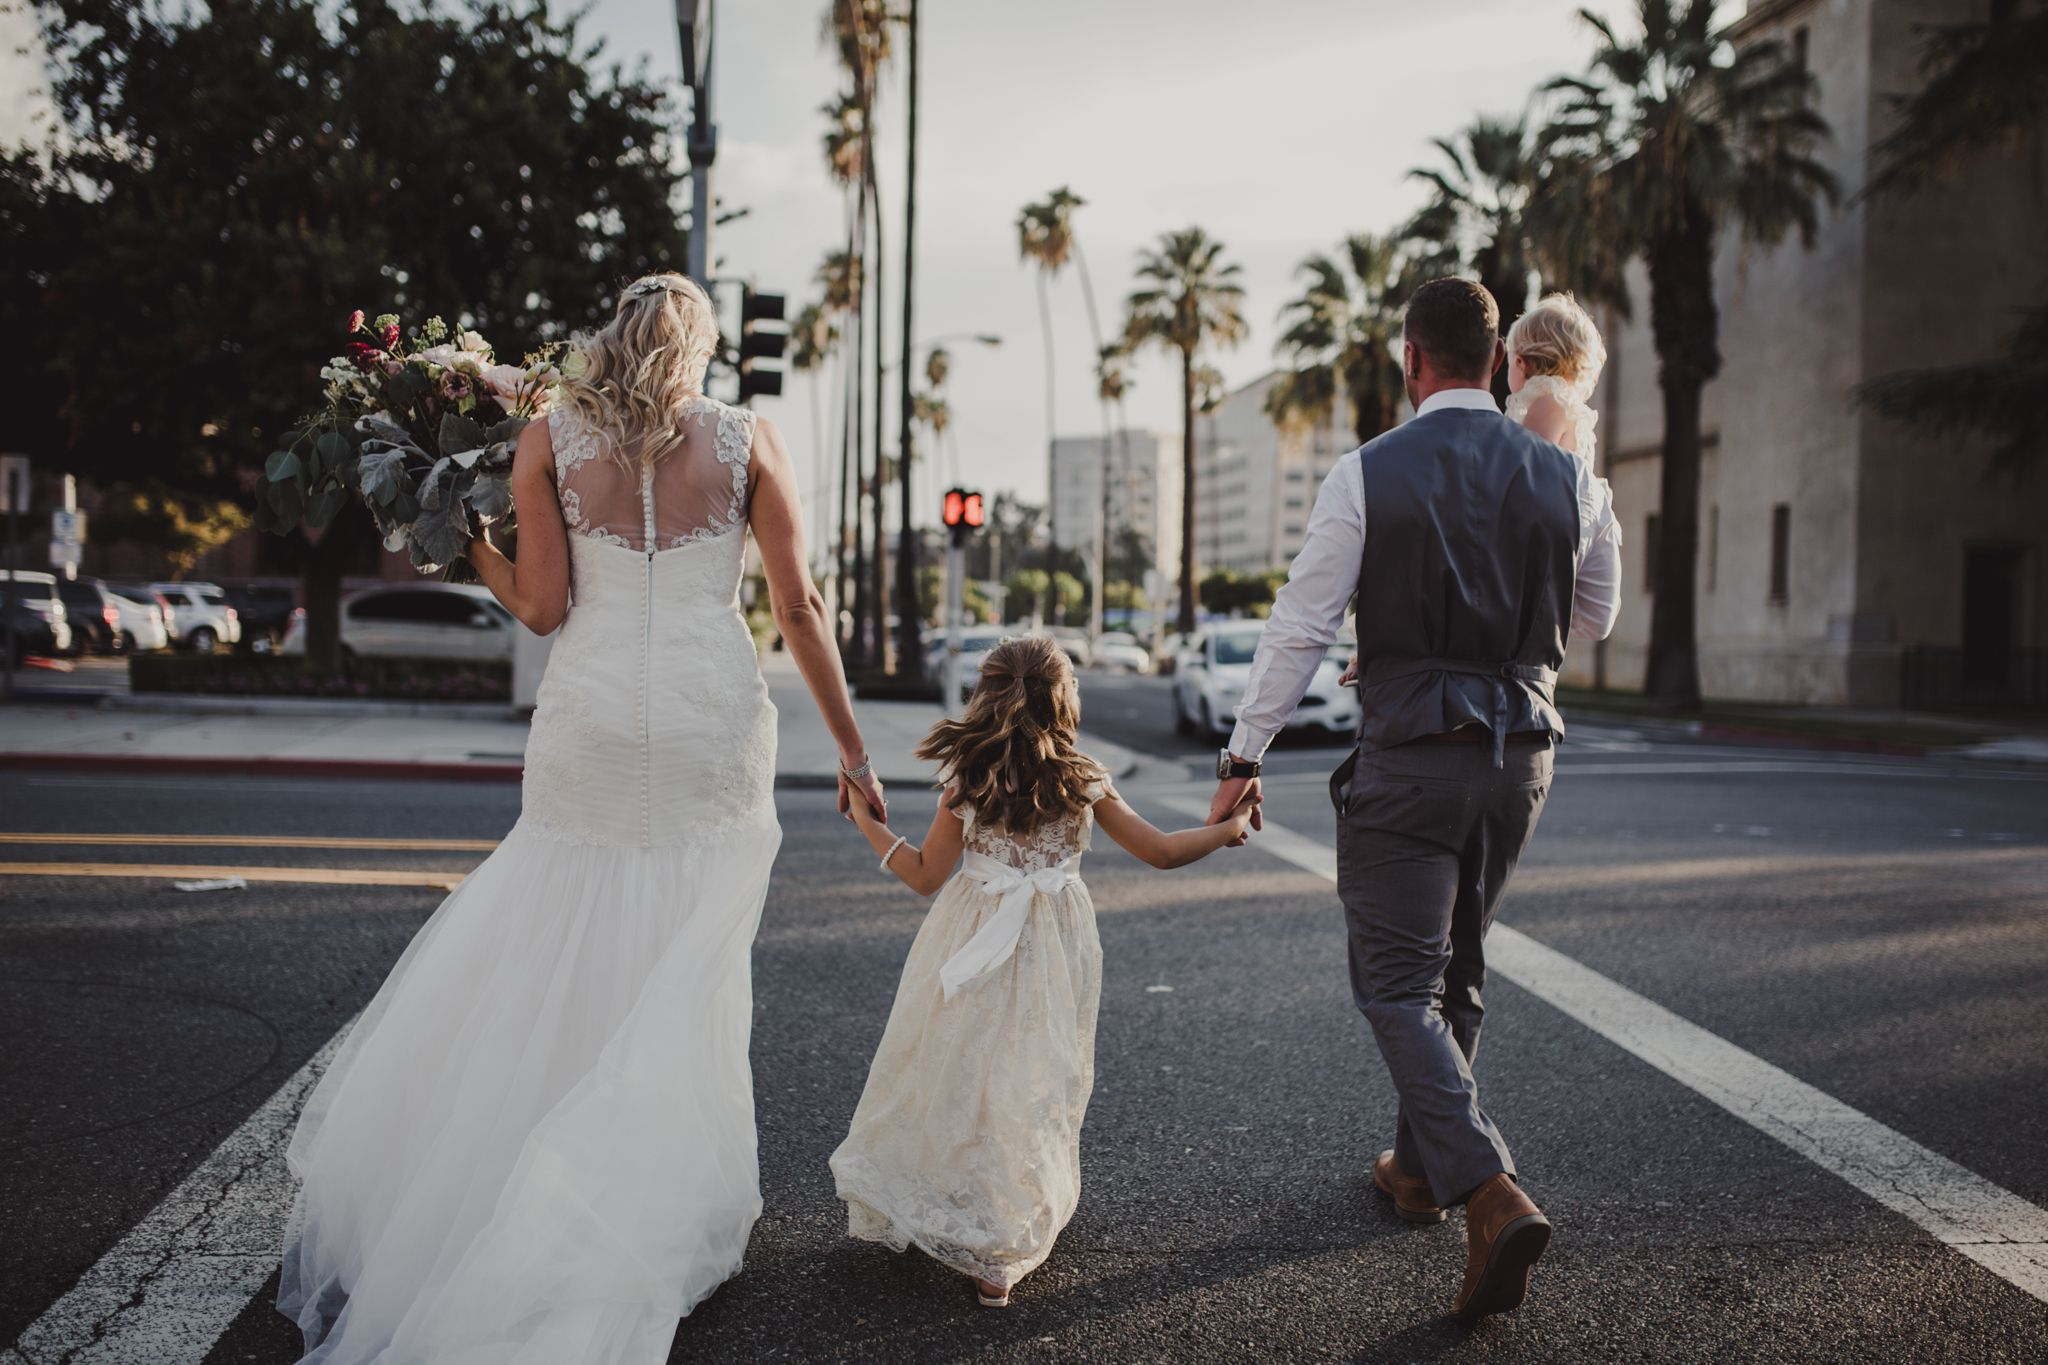 Riverside, CA Wedding, city wedding, traveling photographer, pretty ...